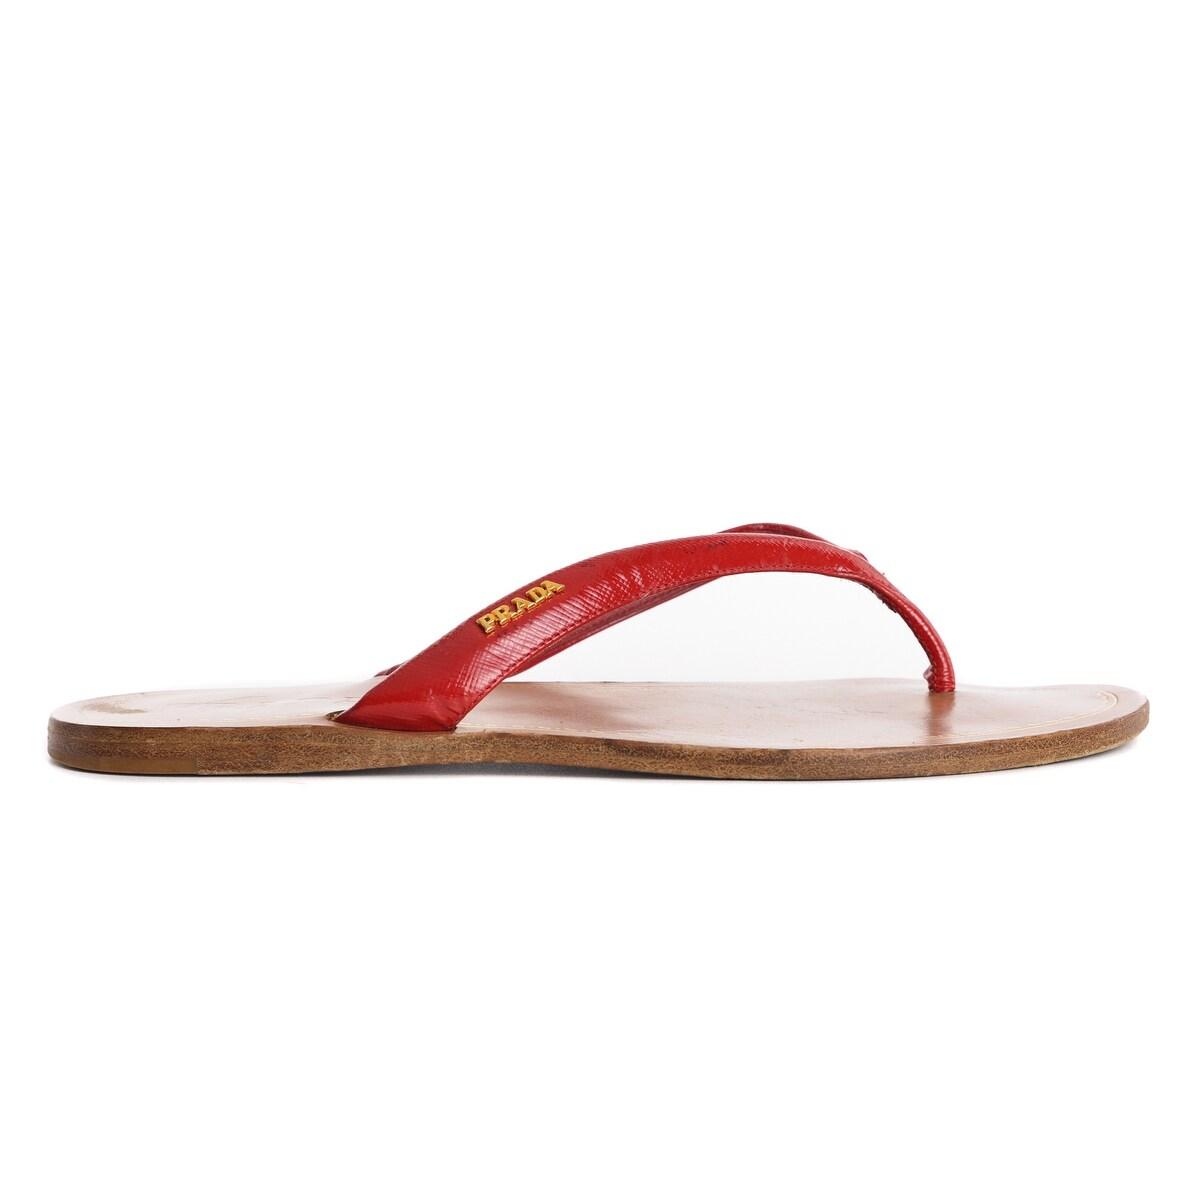 b07edbe6622cc Shop Prada Womens Red Patent Leather Thong Flat Sandals Sz 39 9 ~RTL ...